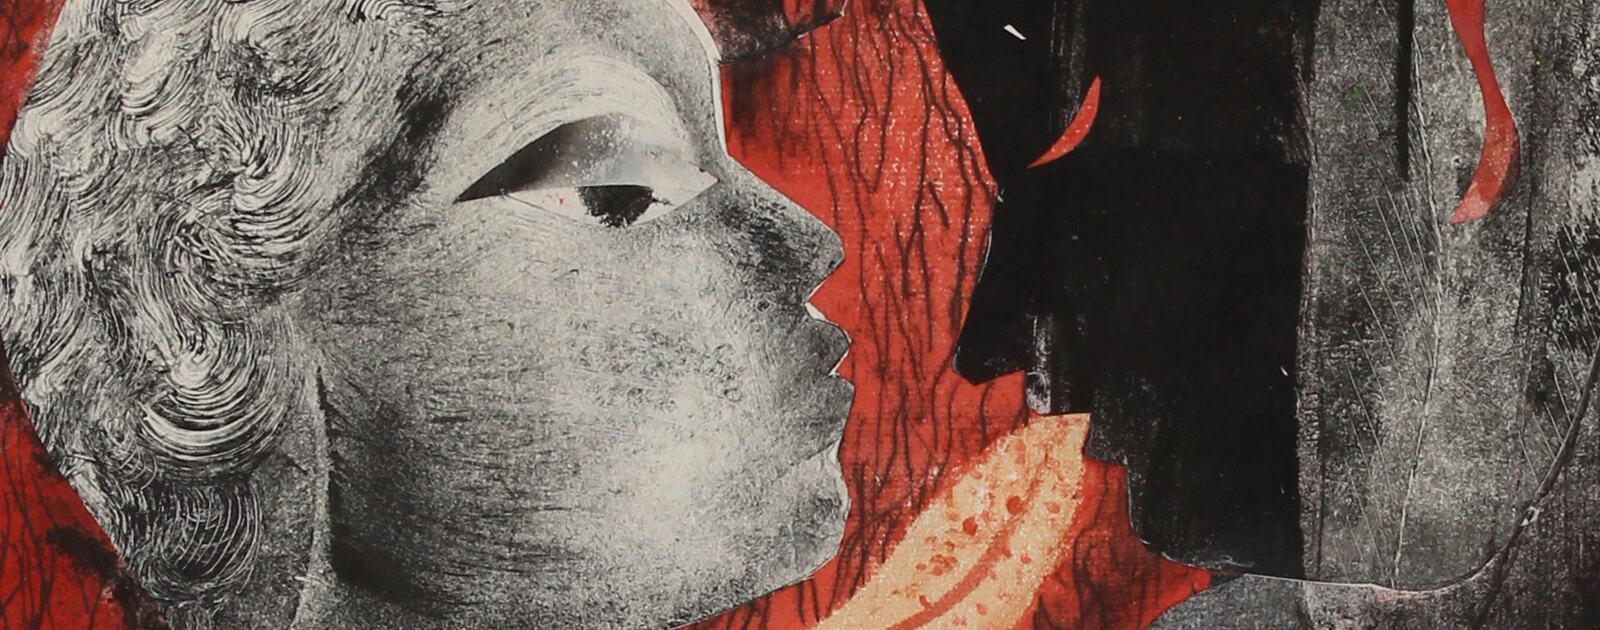 Language Shift, collage art